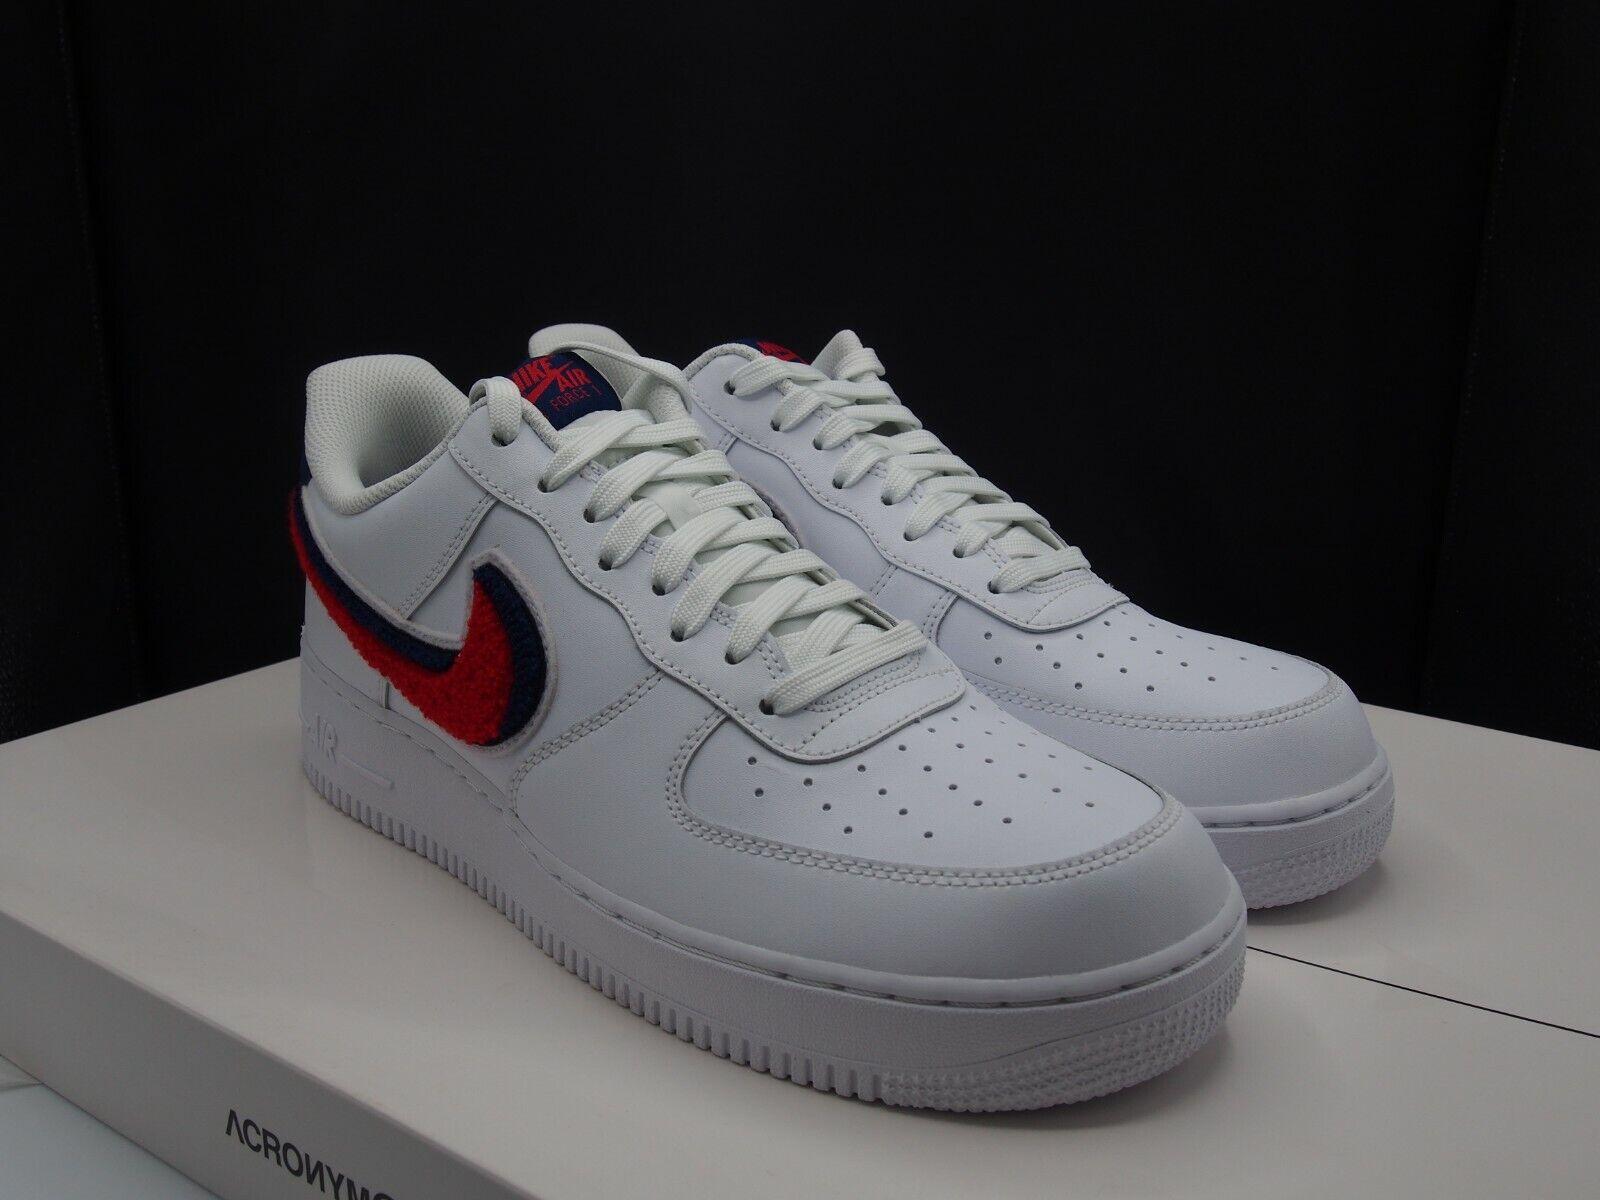 Nike Air Force 1 '07 Lv8 Chenille